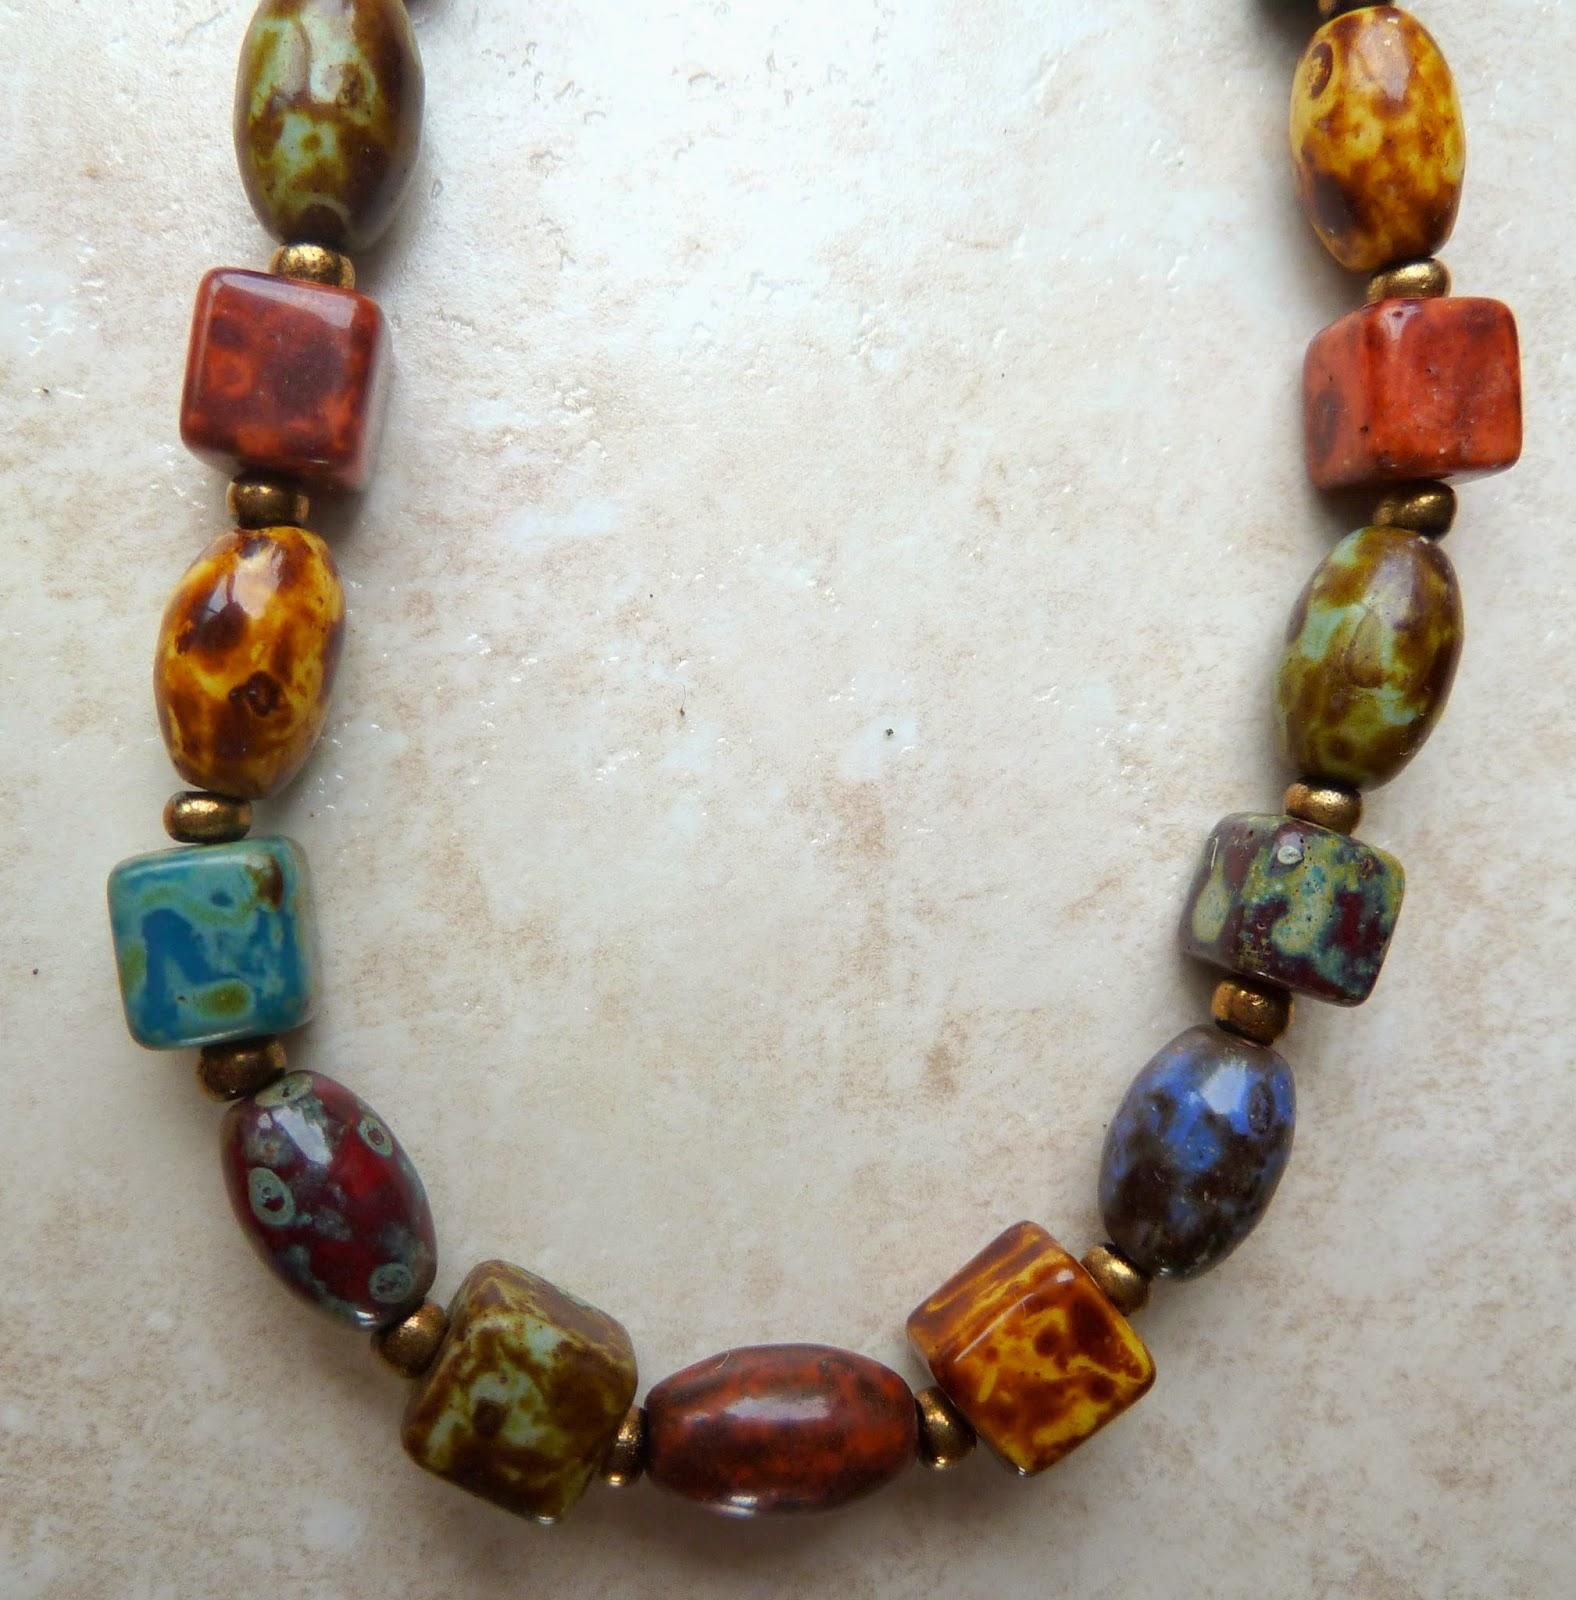 http://www.kcavintagegems.uk/vintage-scottish-murano-glass-bead-necklace-383-p.asp